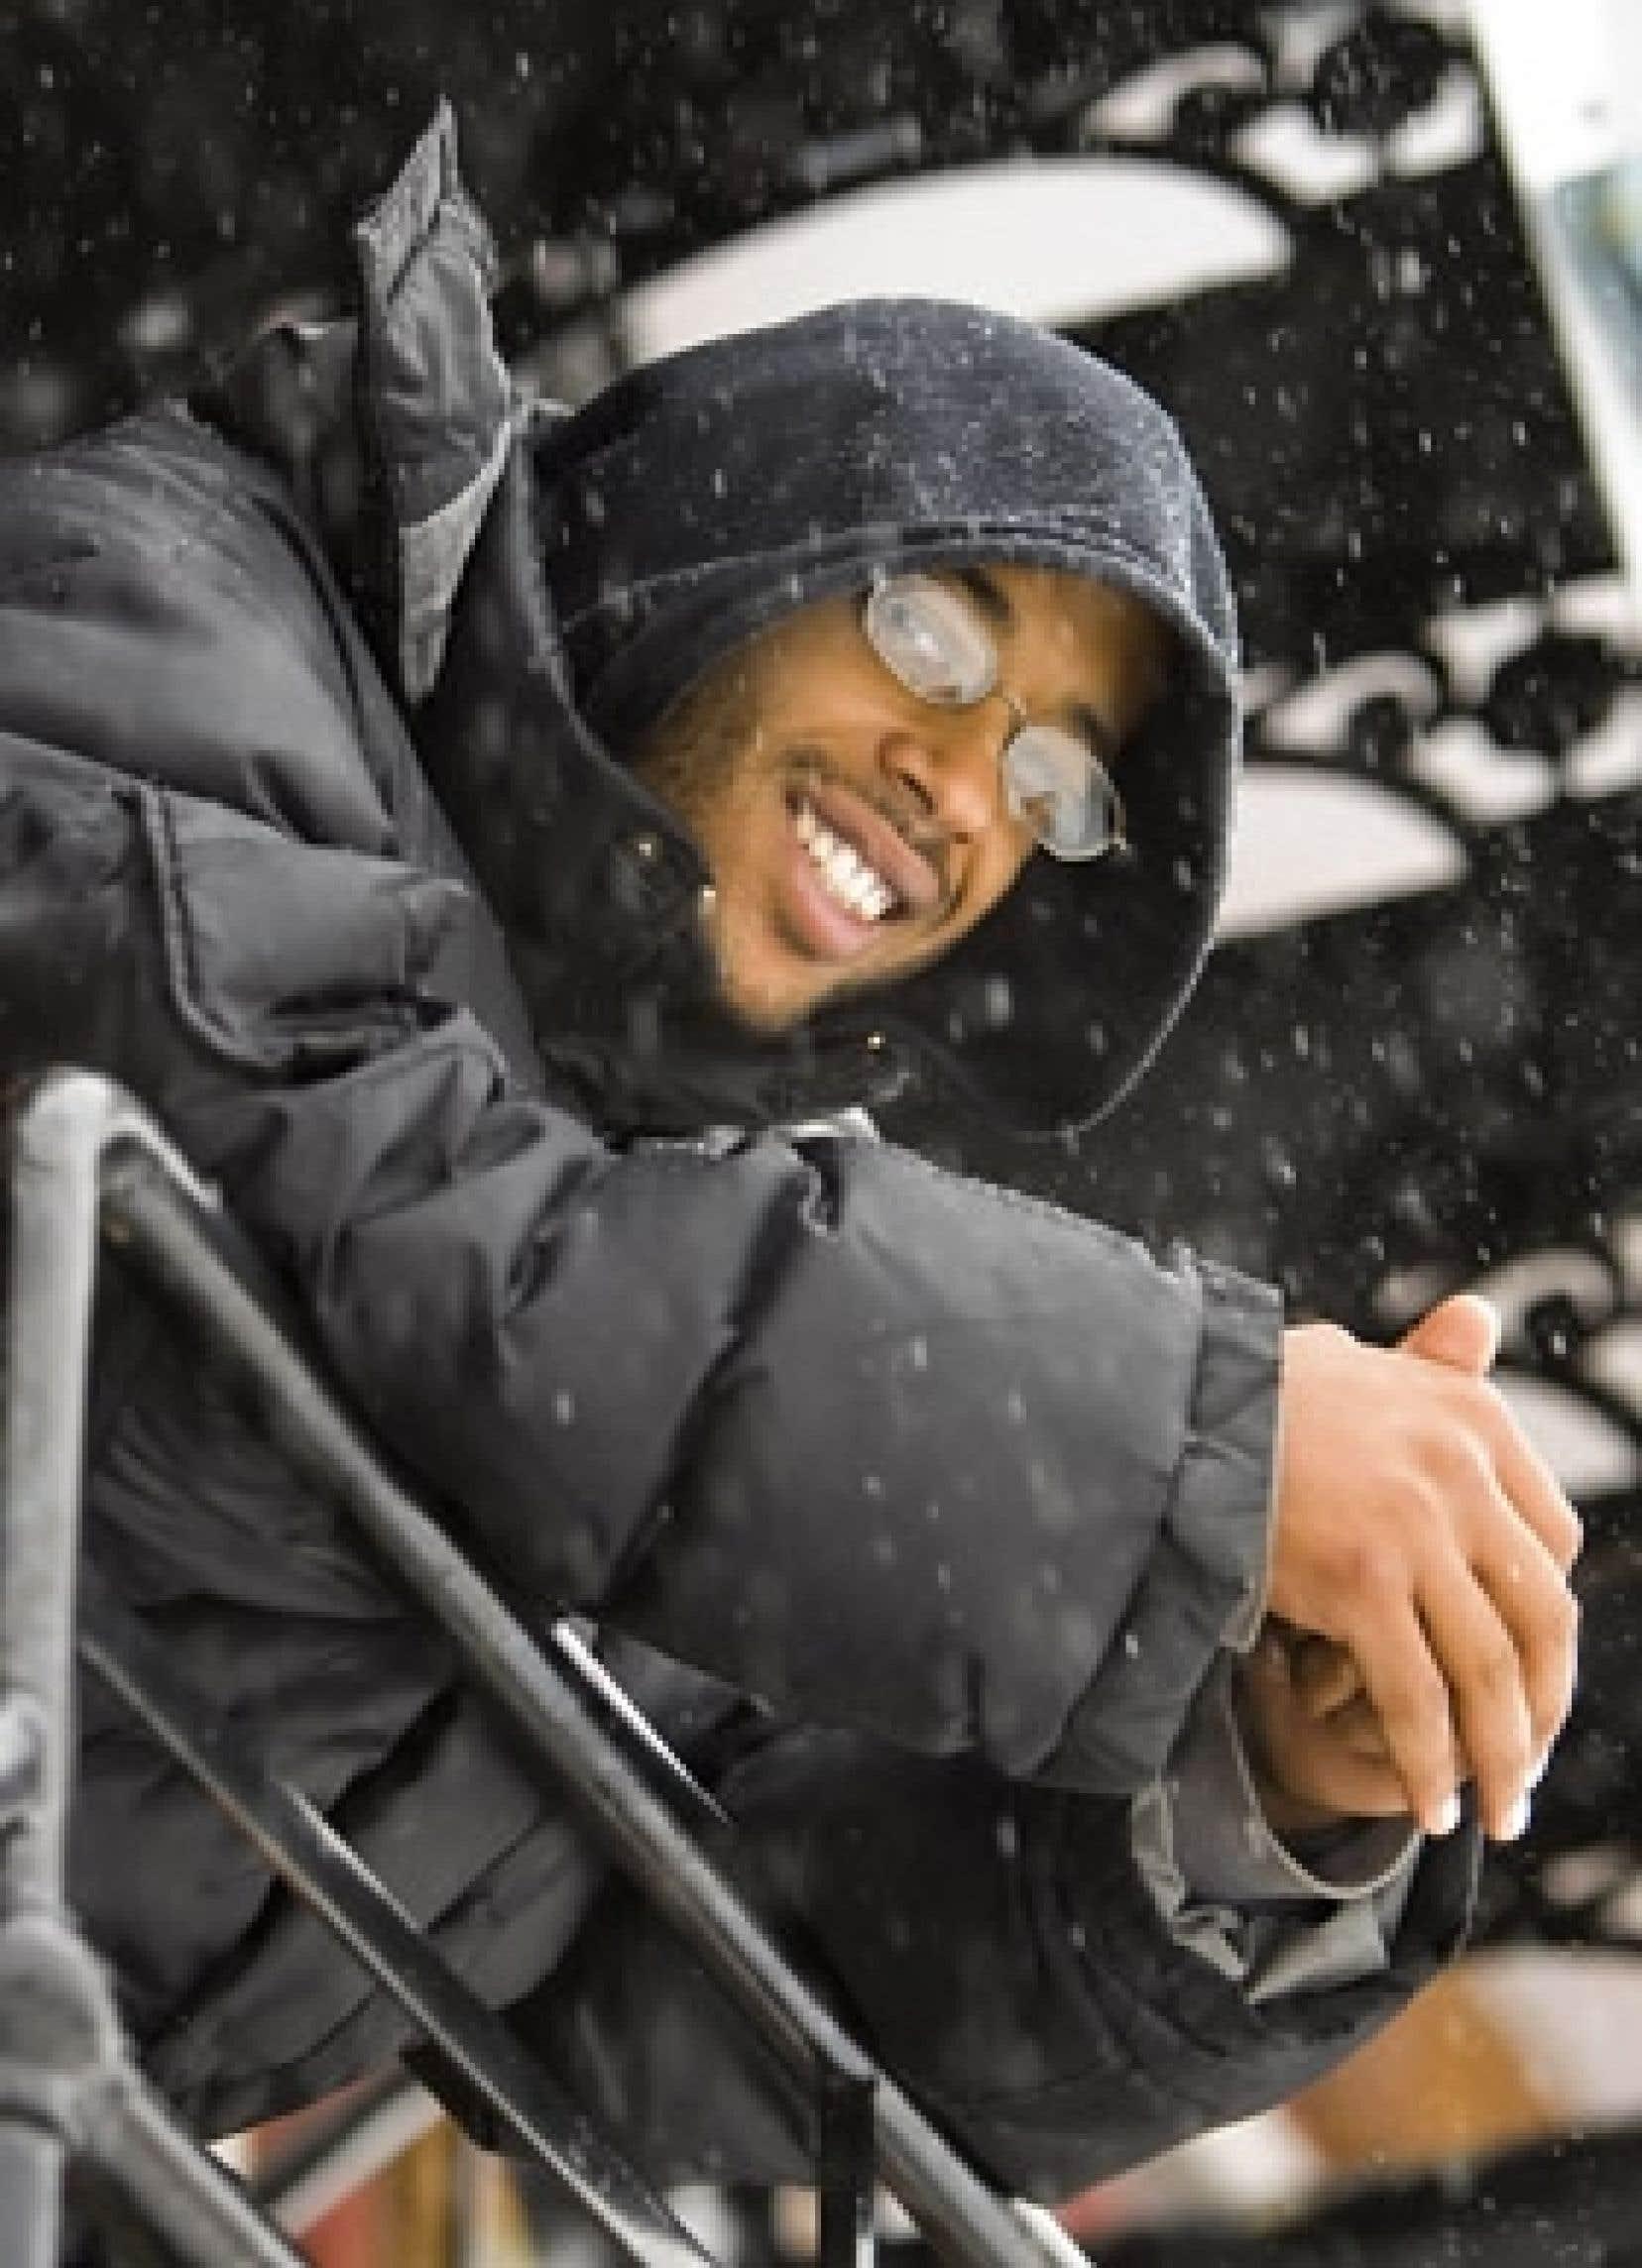 Le rappeur Ali Ndiaye, alias Webster